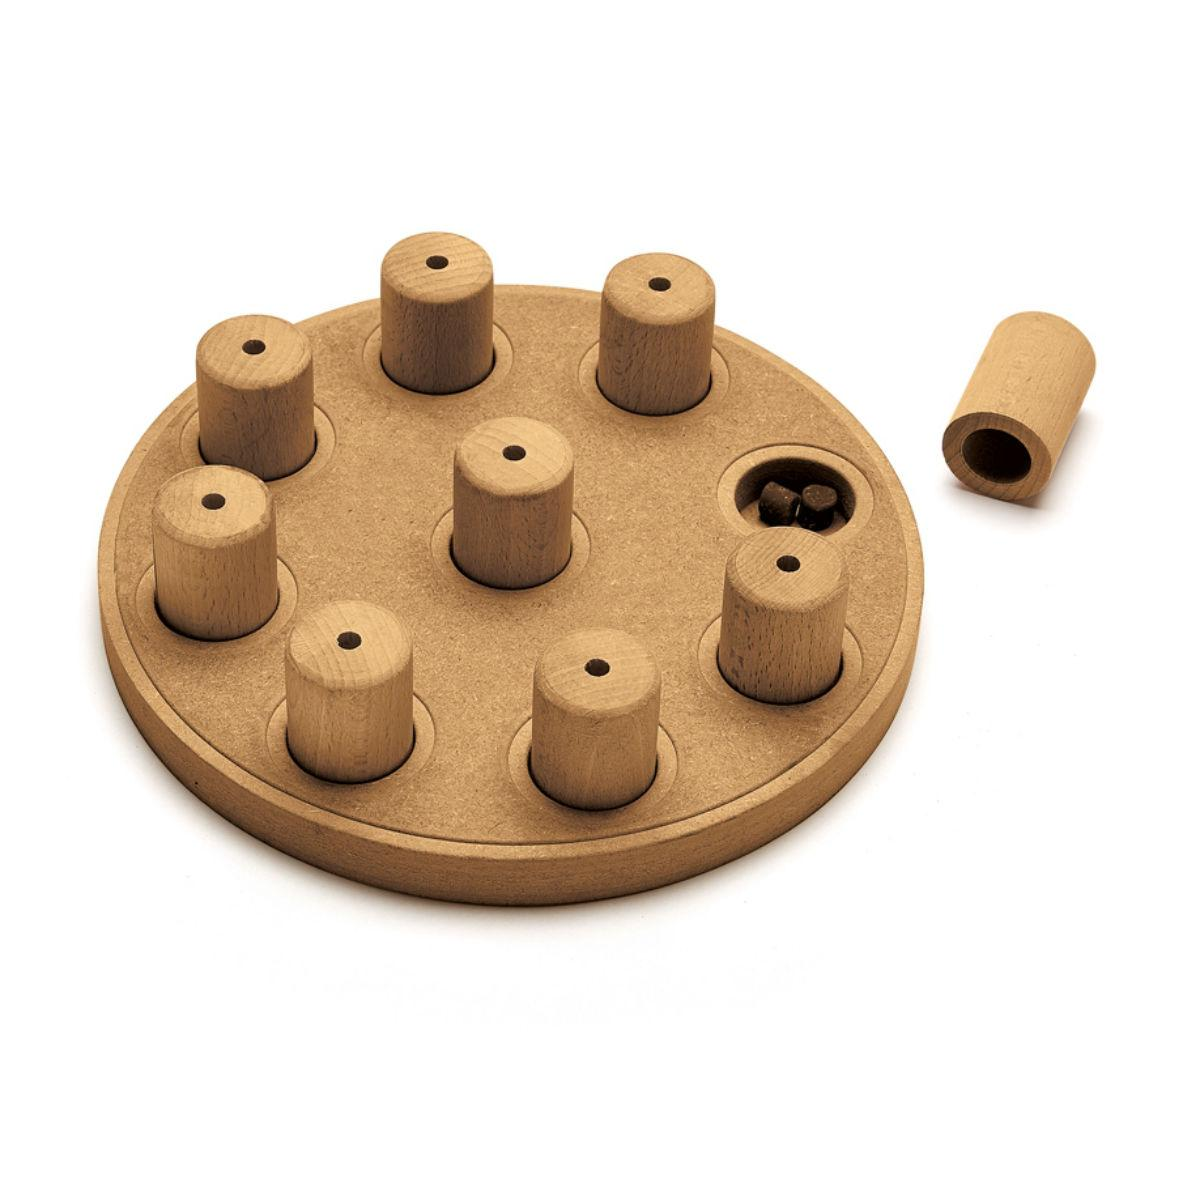 Nina Ottosson Smart Puzzle Dog Toy - Composite